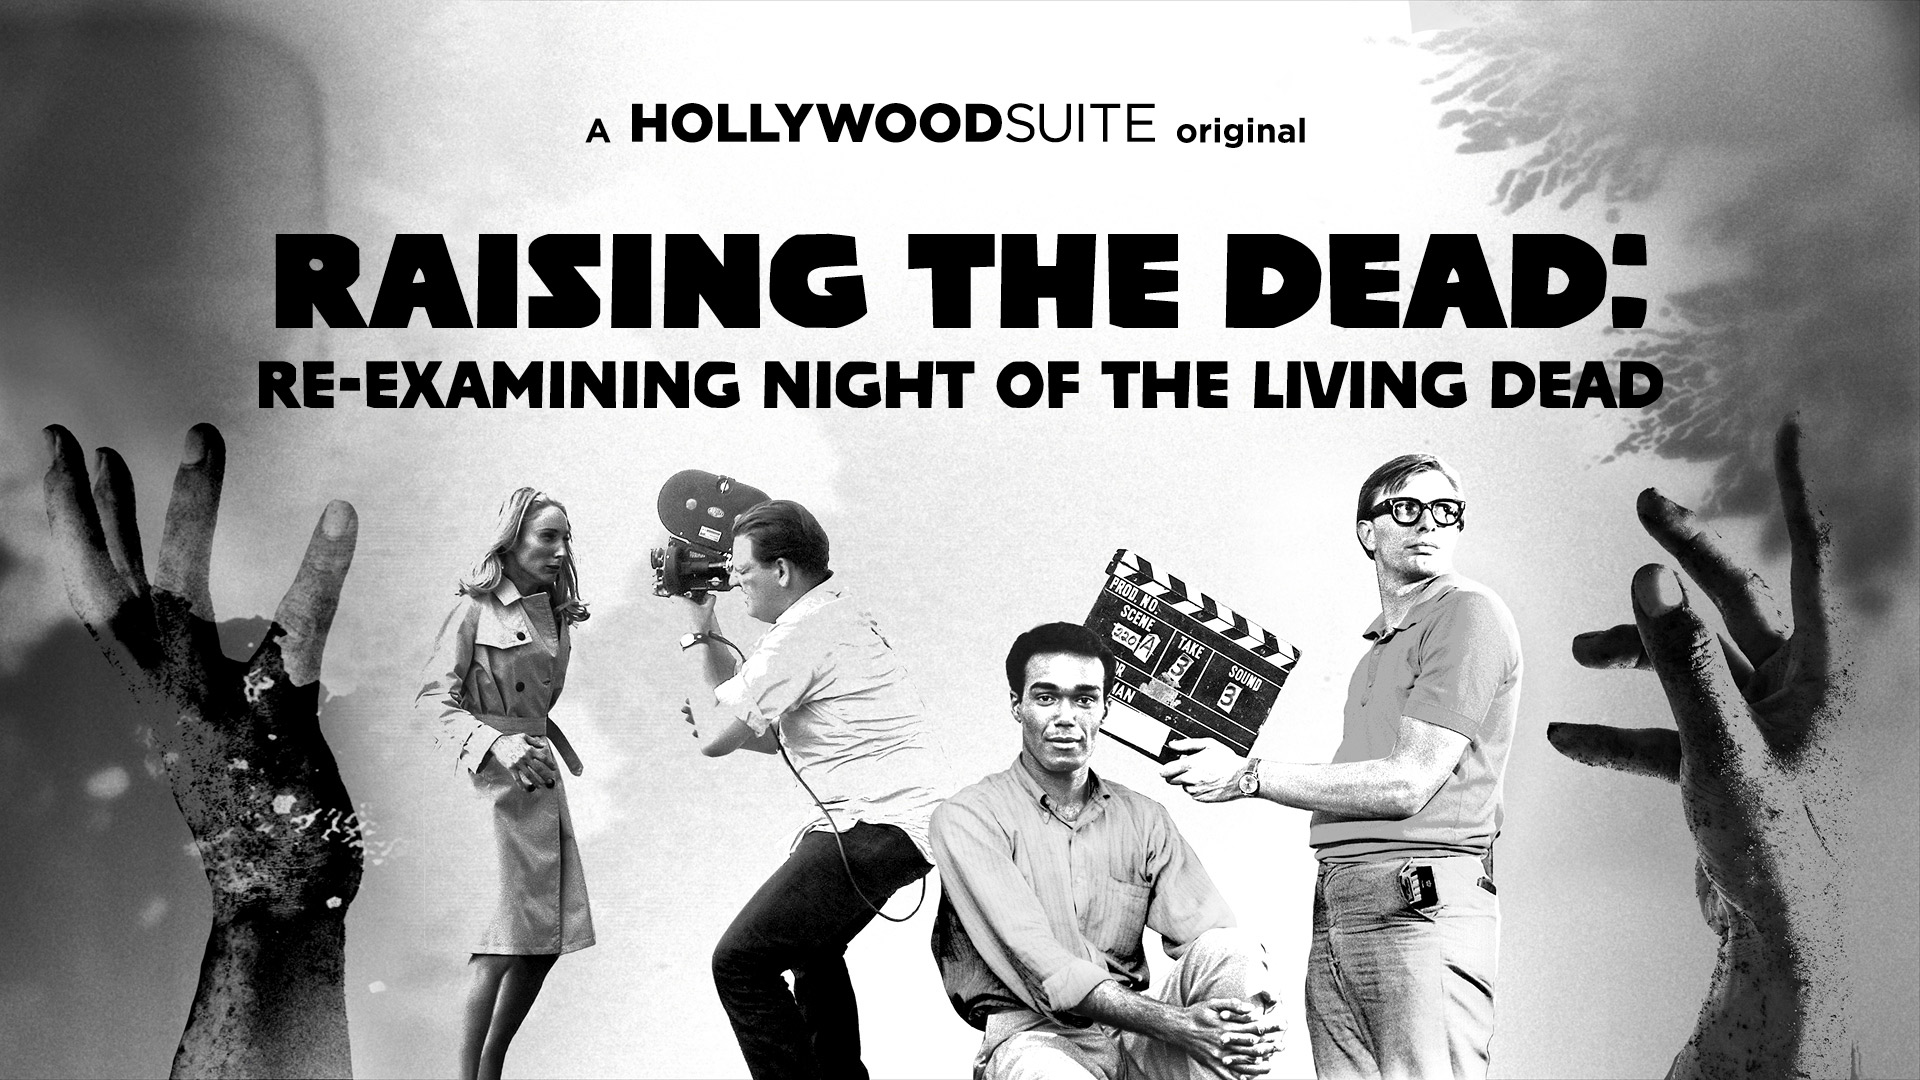 Raising The Dead: Re-examining Night Of The Living Dead